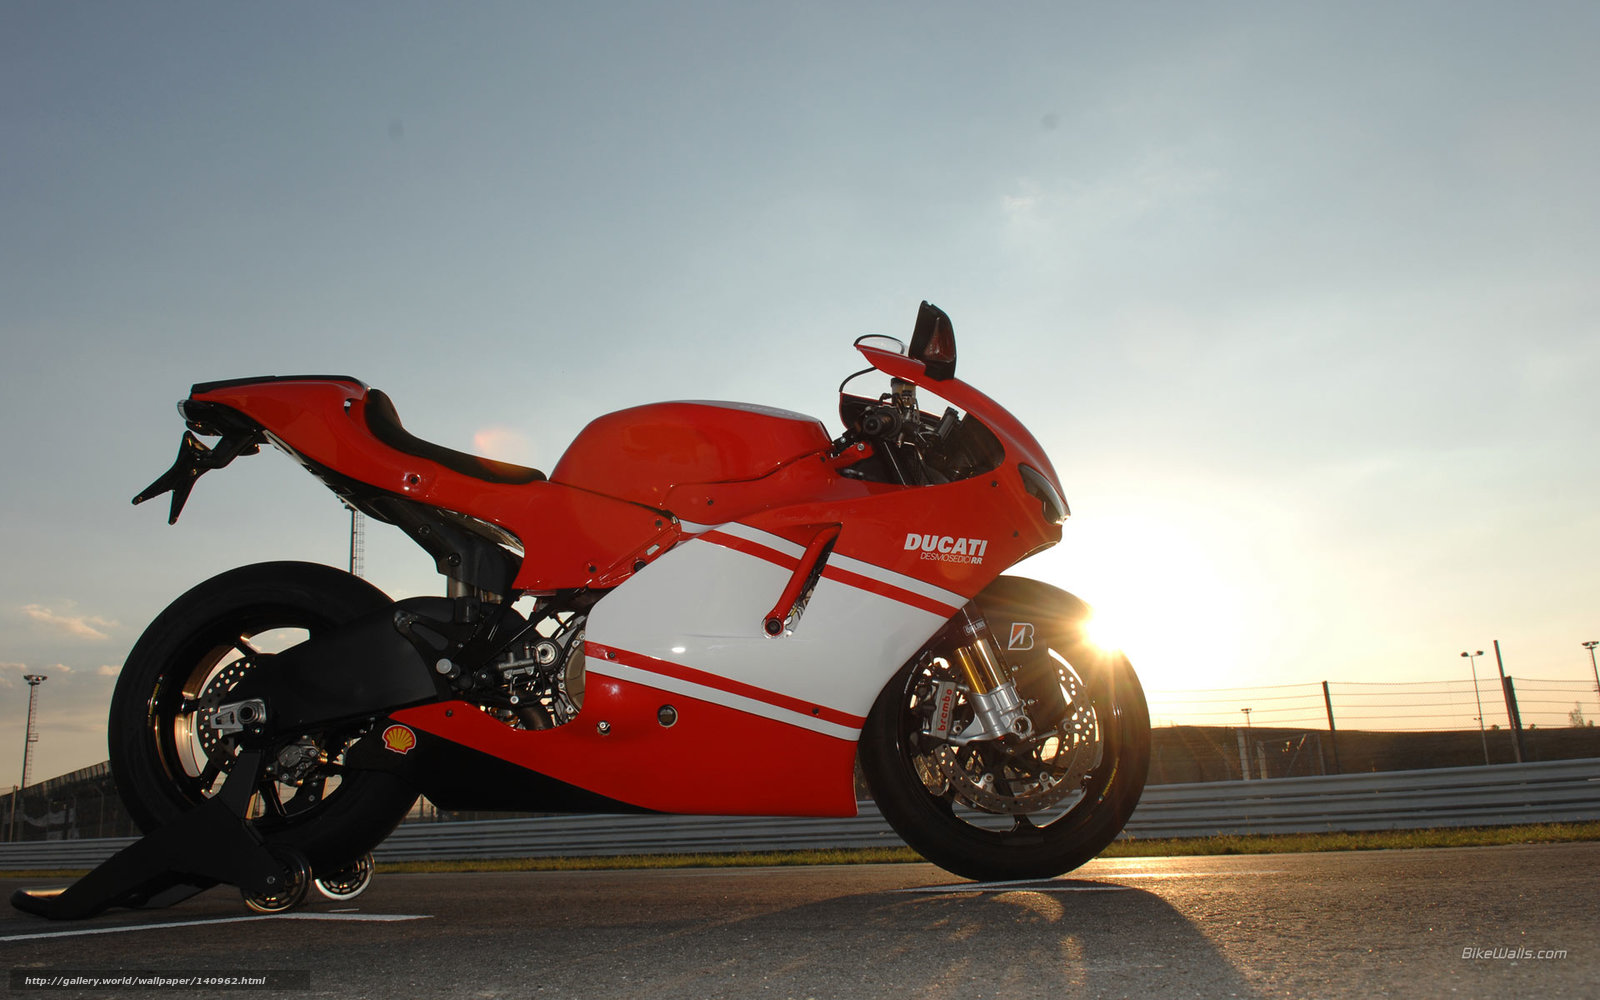 Обои Ducati, rr, desmosedici. Мотоциклы foto 10